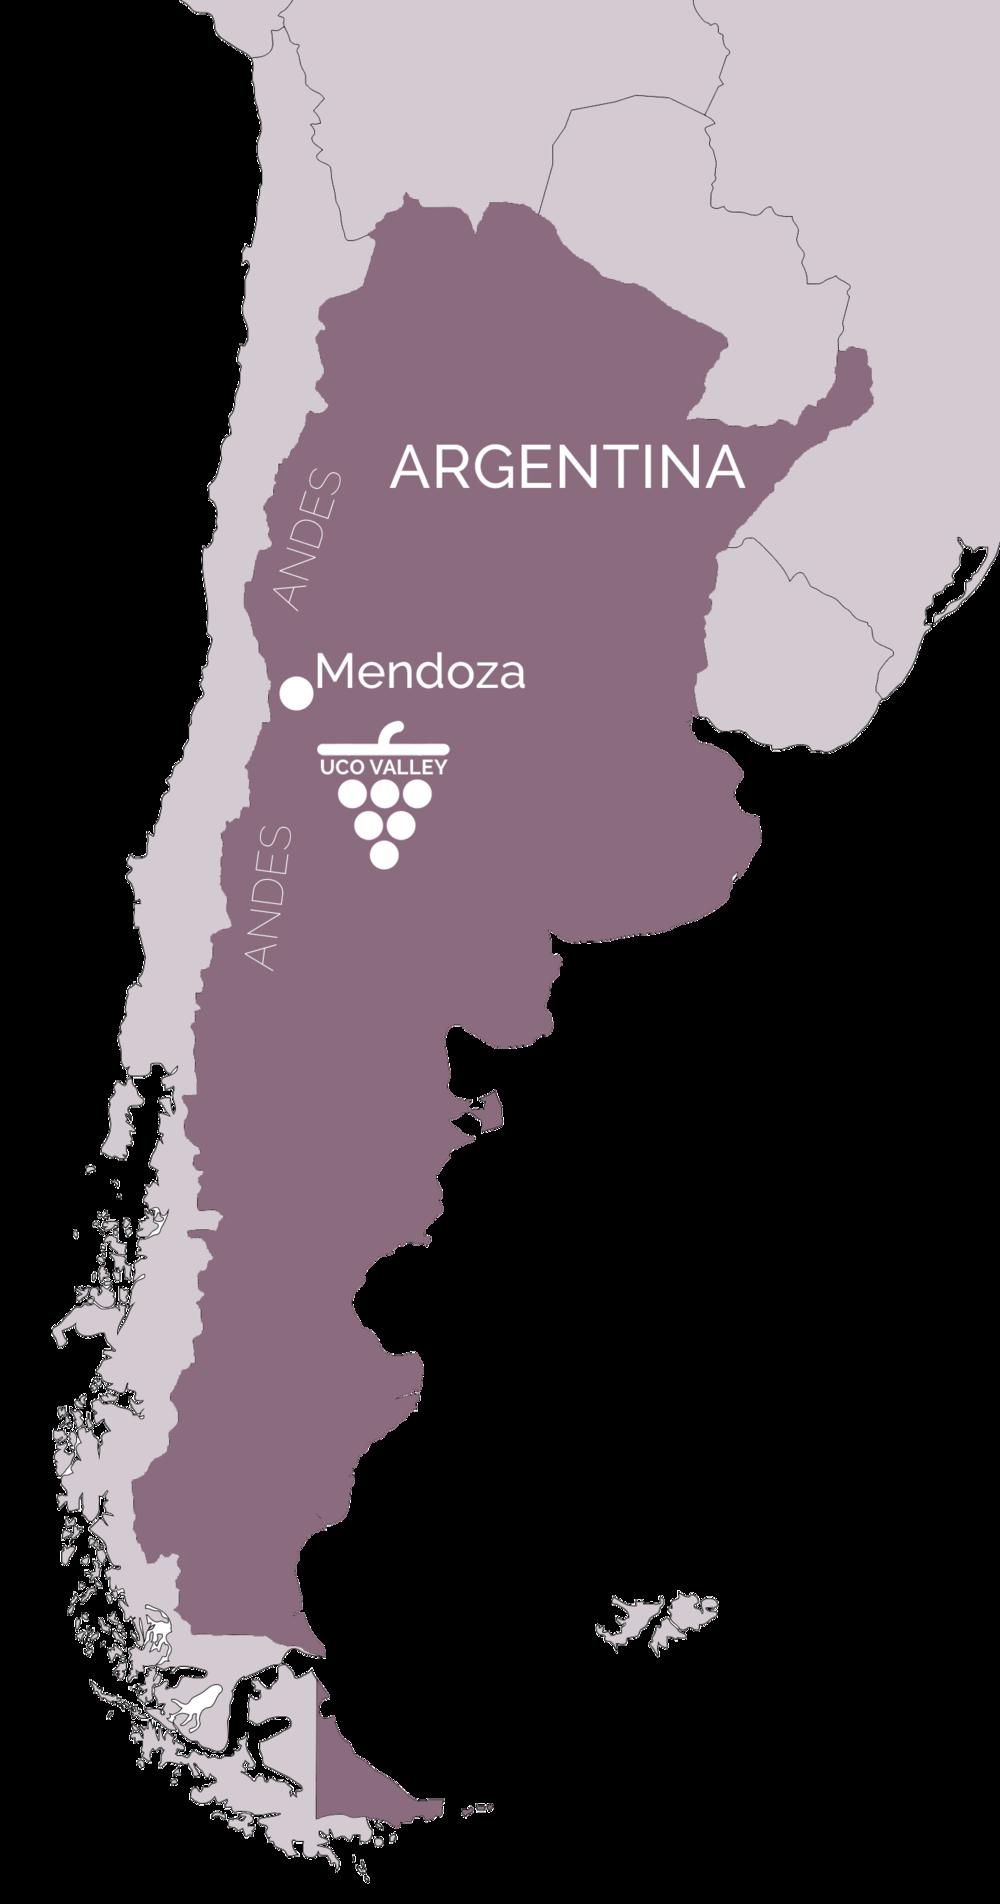 Alexander Wilson - Argentina map png